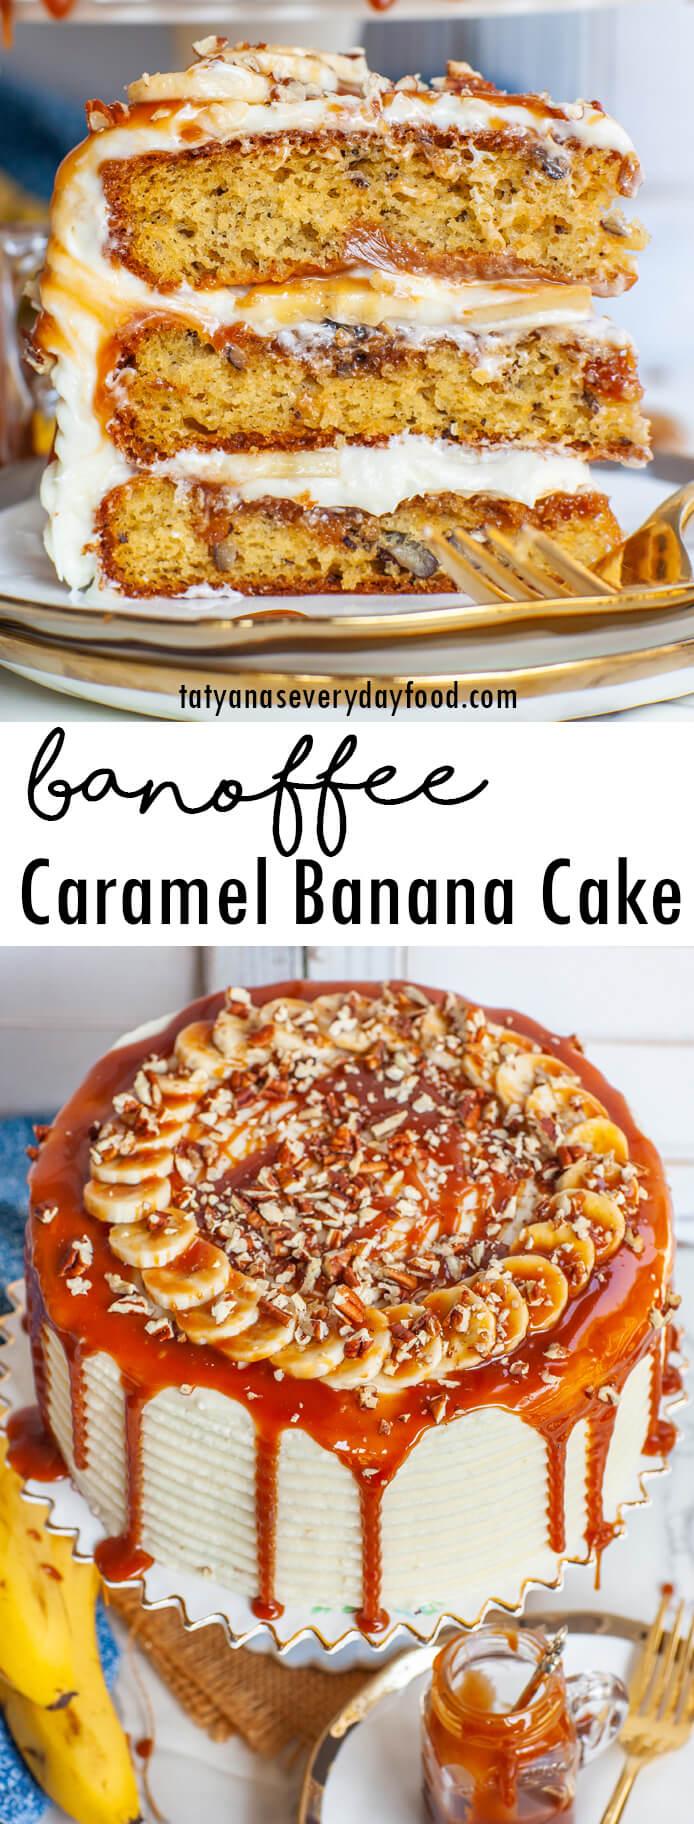 Caramel Banana Banoffee Cake video recipe